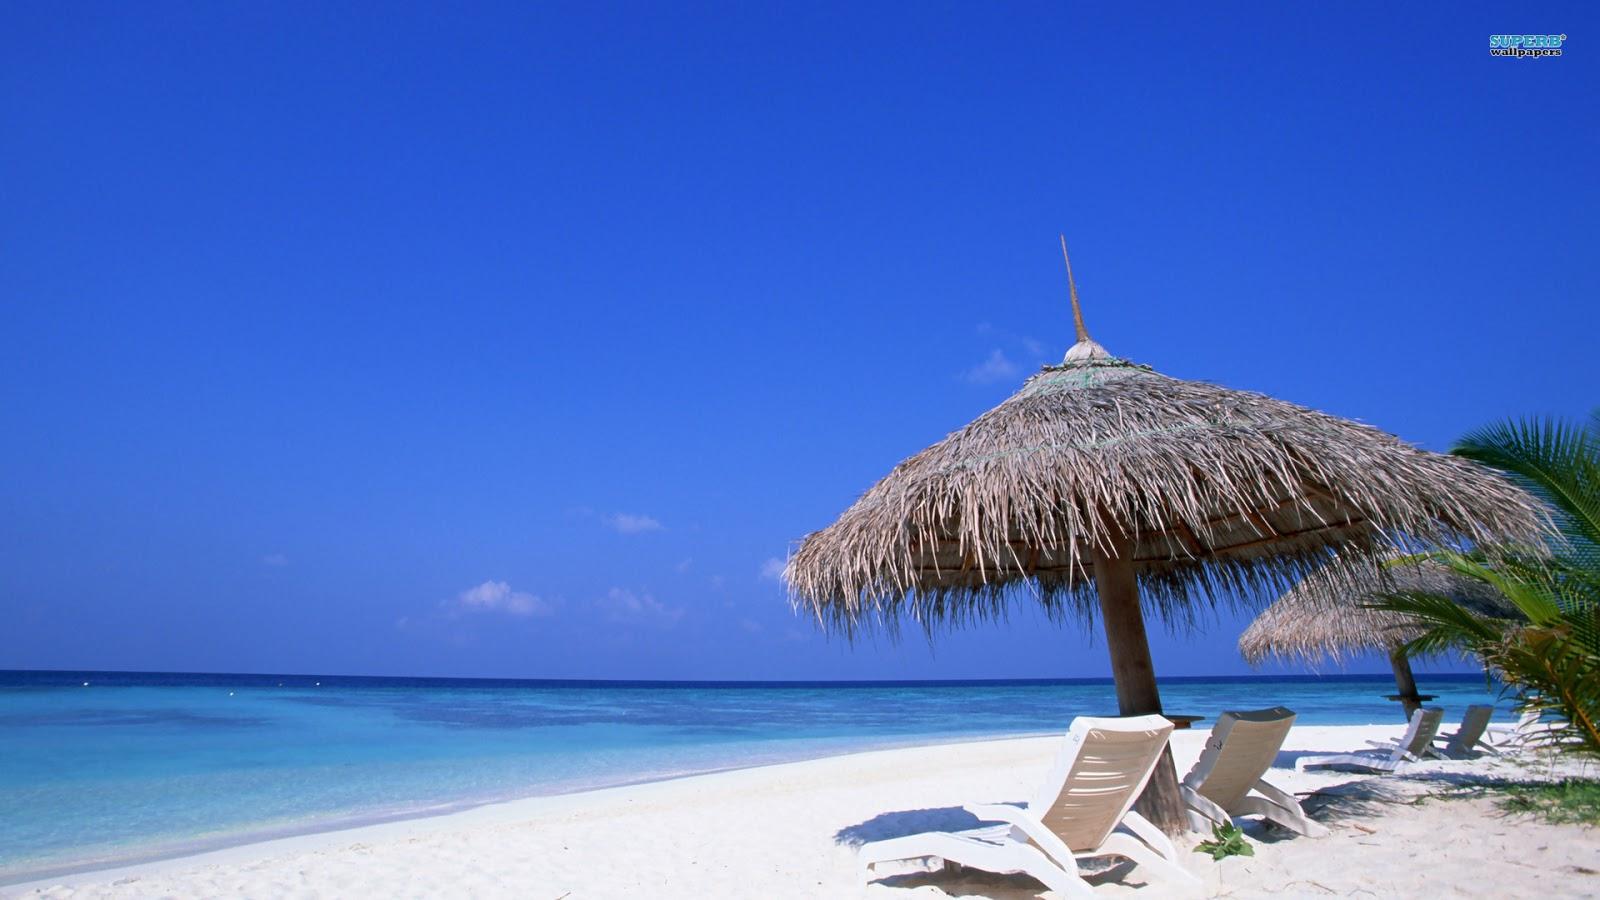 Kylo Ren Wallpaper Iphone X Wallpapers Hd Wallpapers Tropicales Islas Playas Full Hd